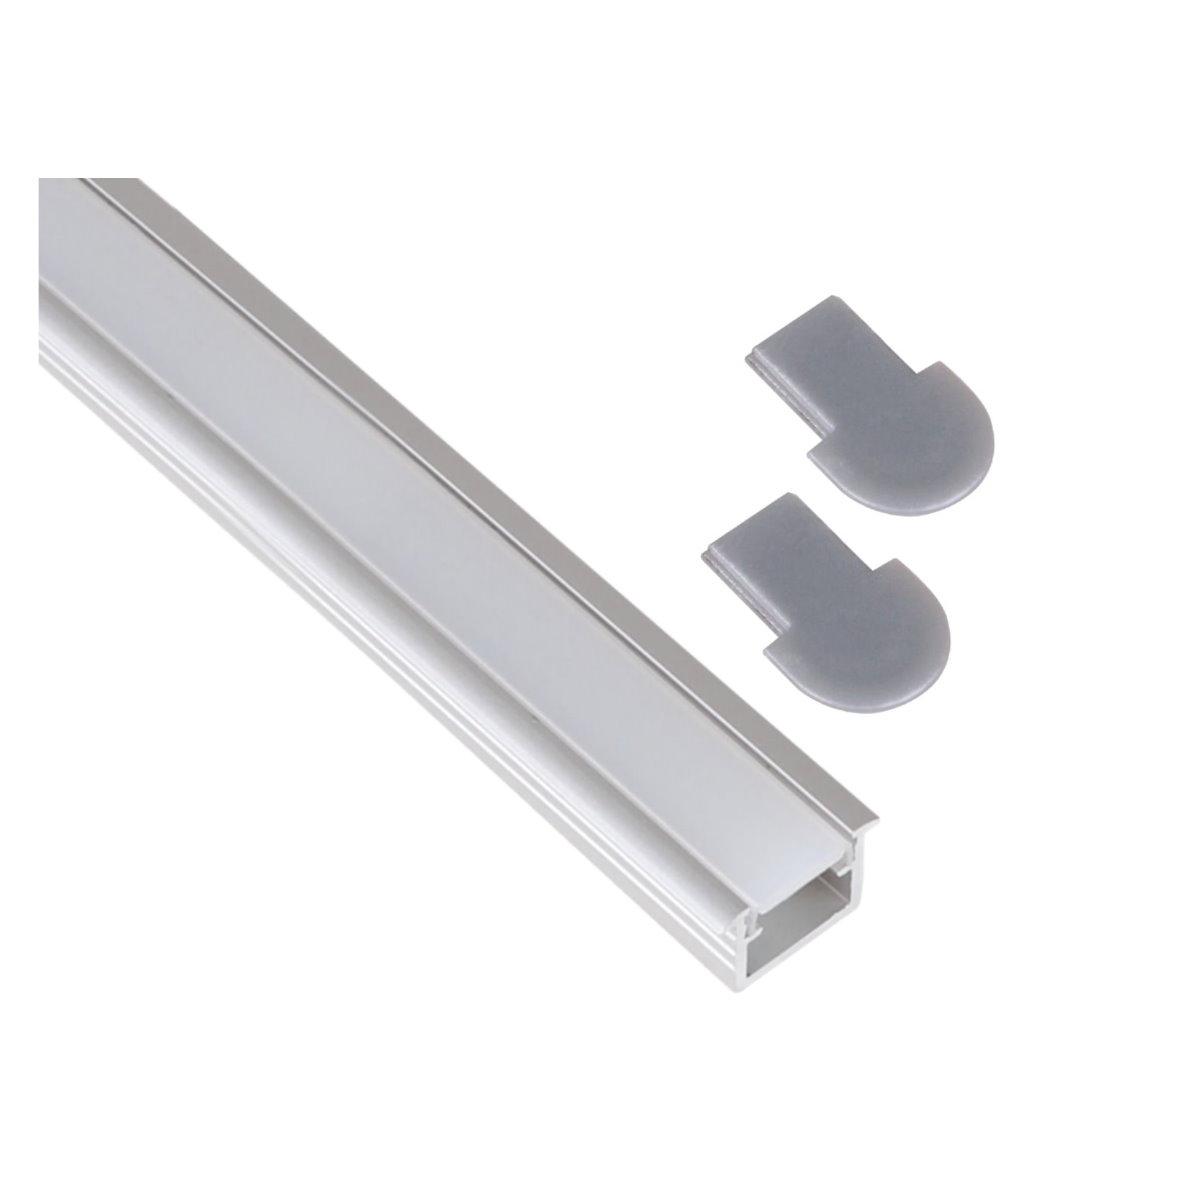 aluminium einbau profil leiste 1m eckig set abdeckung. Black Bedroom Furniture Sets. Home Design Ideas